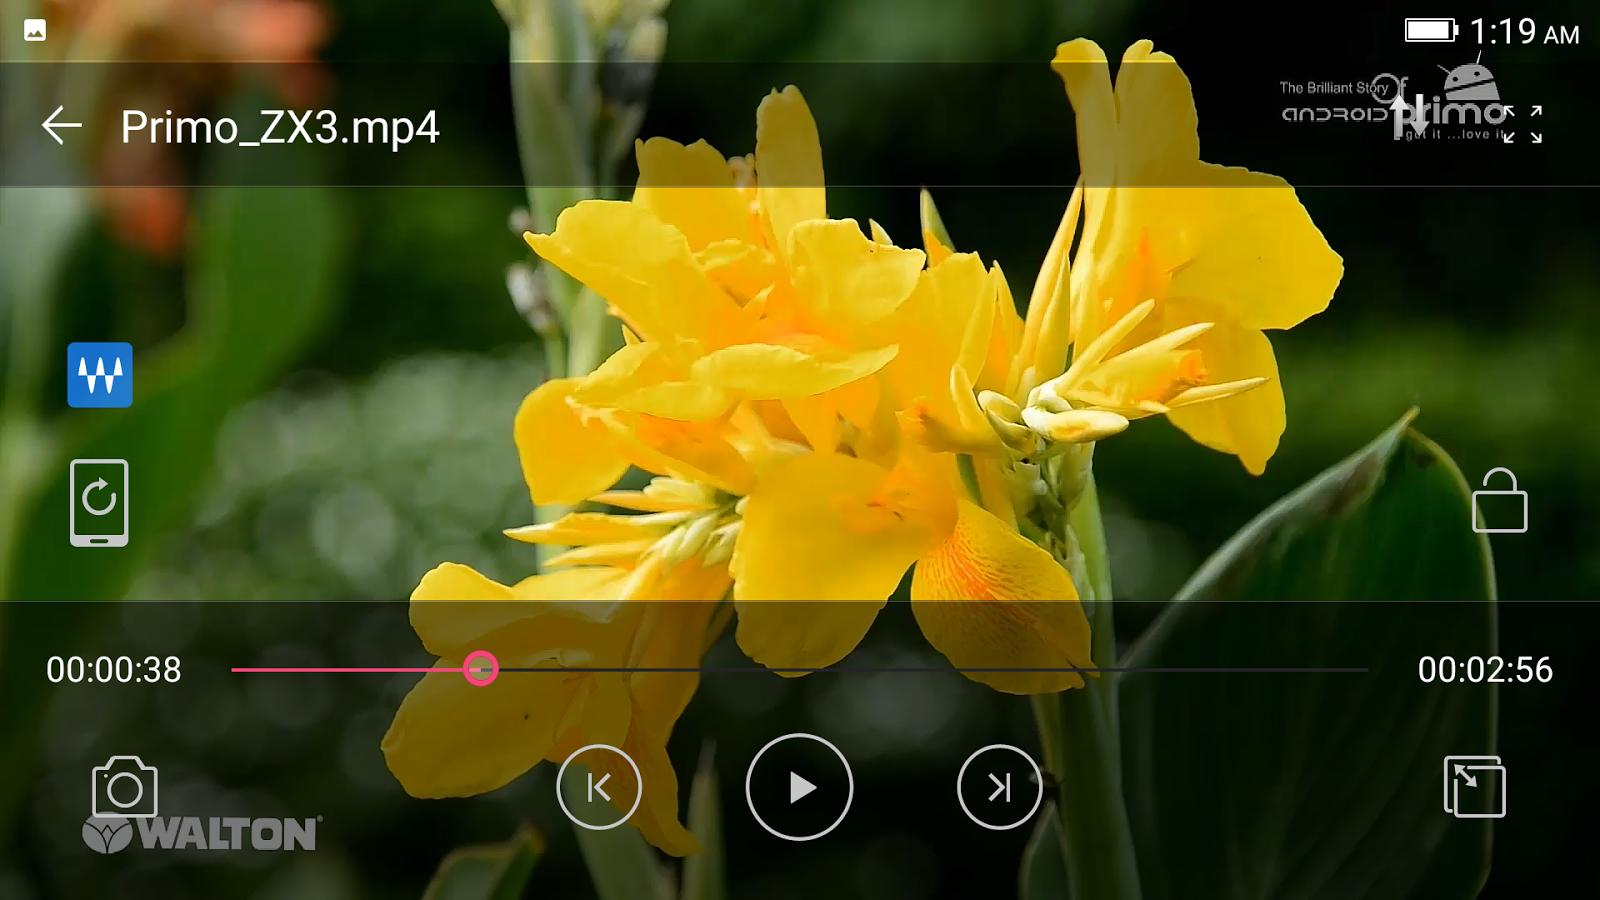 Primo ZX3 video review হ্যান্ডস-অন রিভিউঃ ডুয়েল রেয়ার ক্যামেরার Walton Primo ZX3